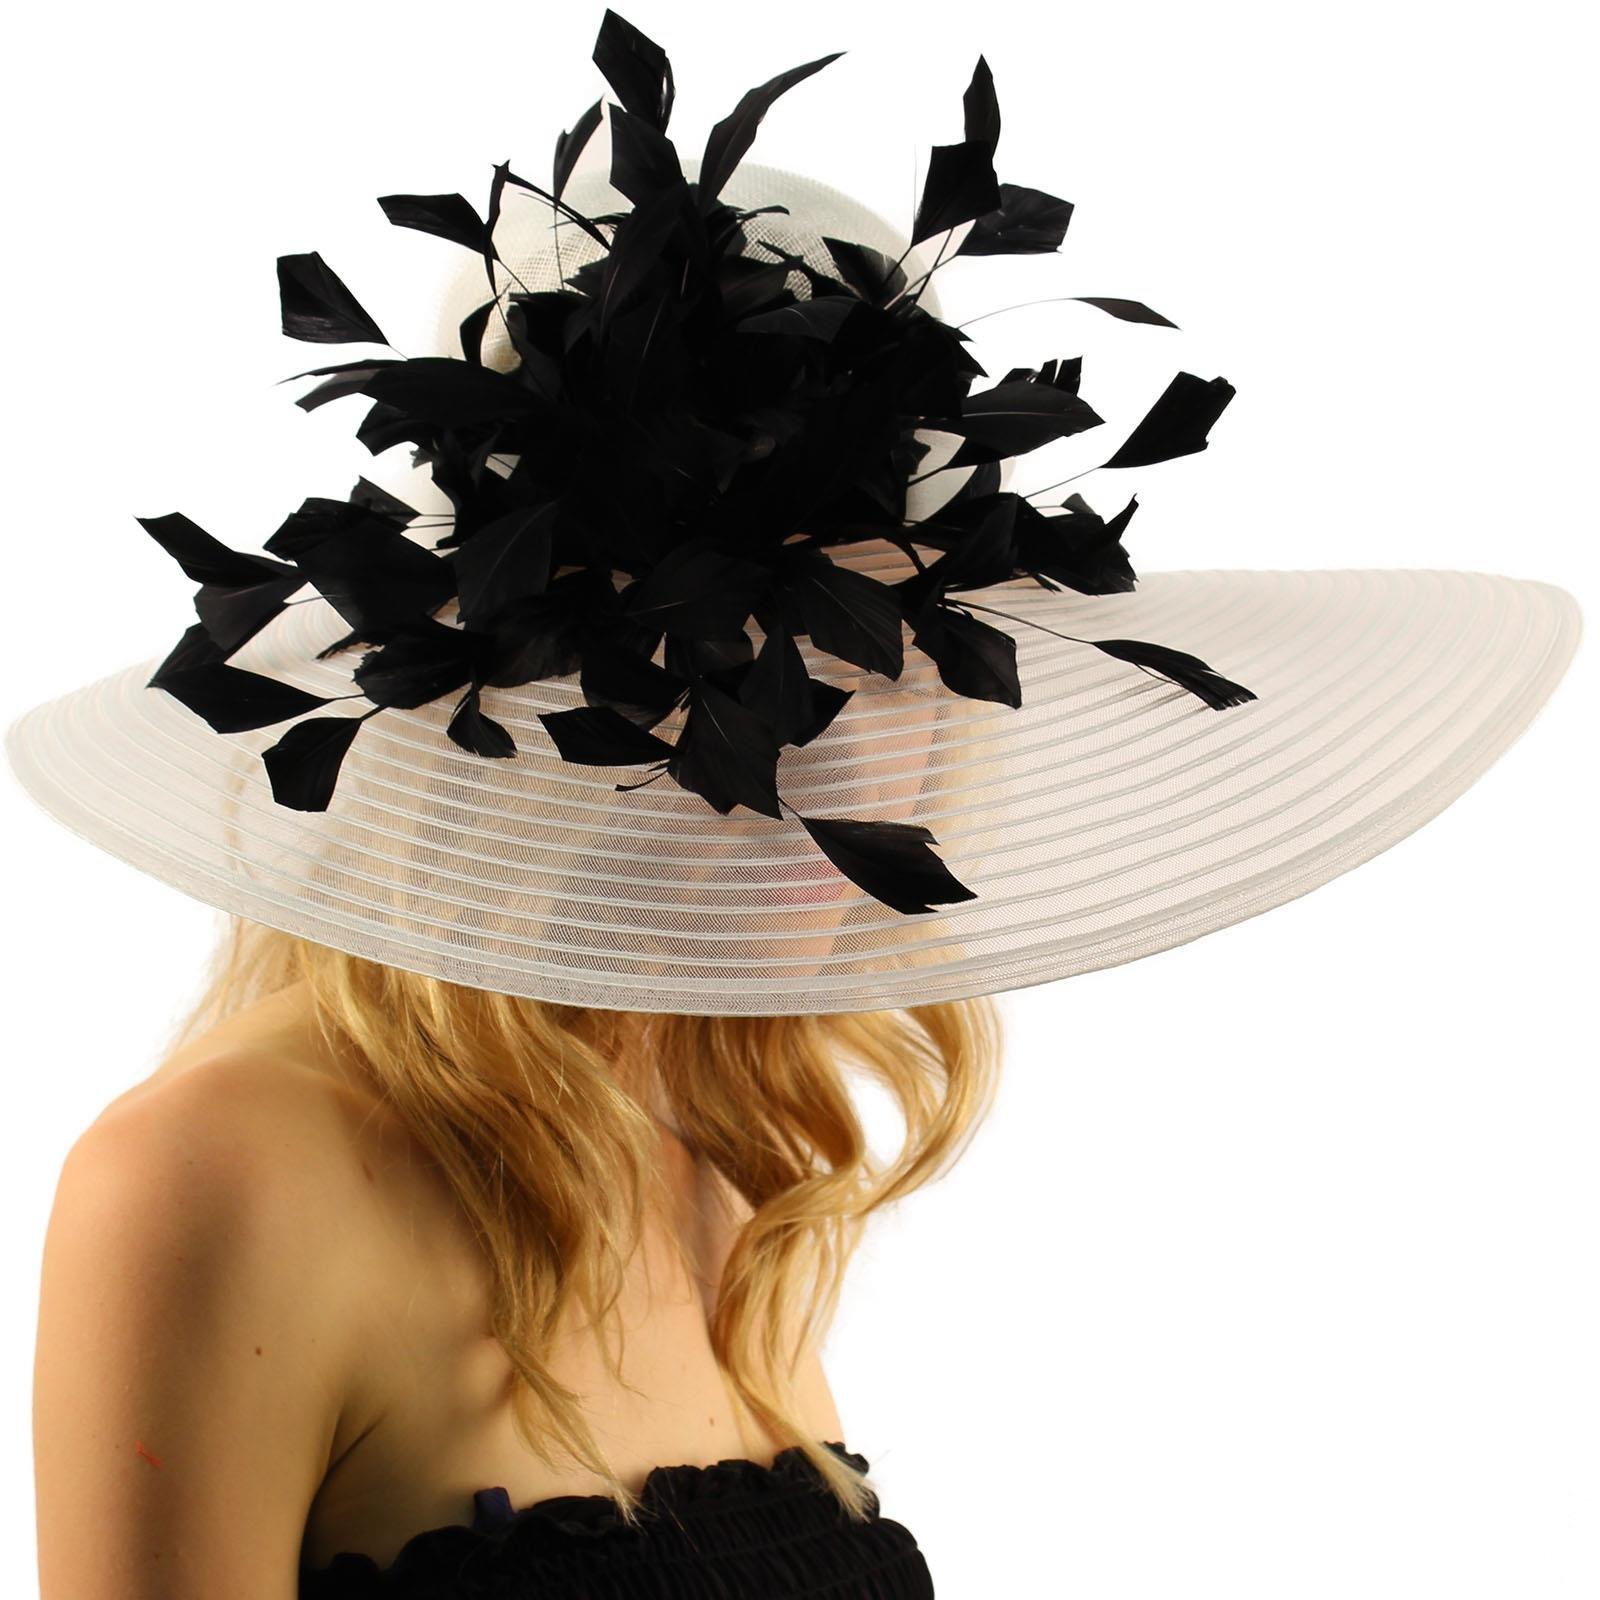 Spectacular Spray Feathers Sinamay Derby Floppy Wide Brim 7'' Dress Hat White/Black